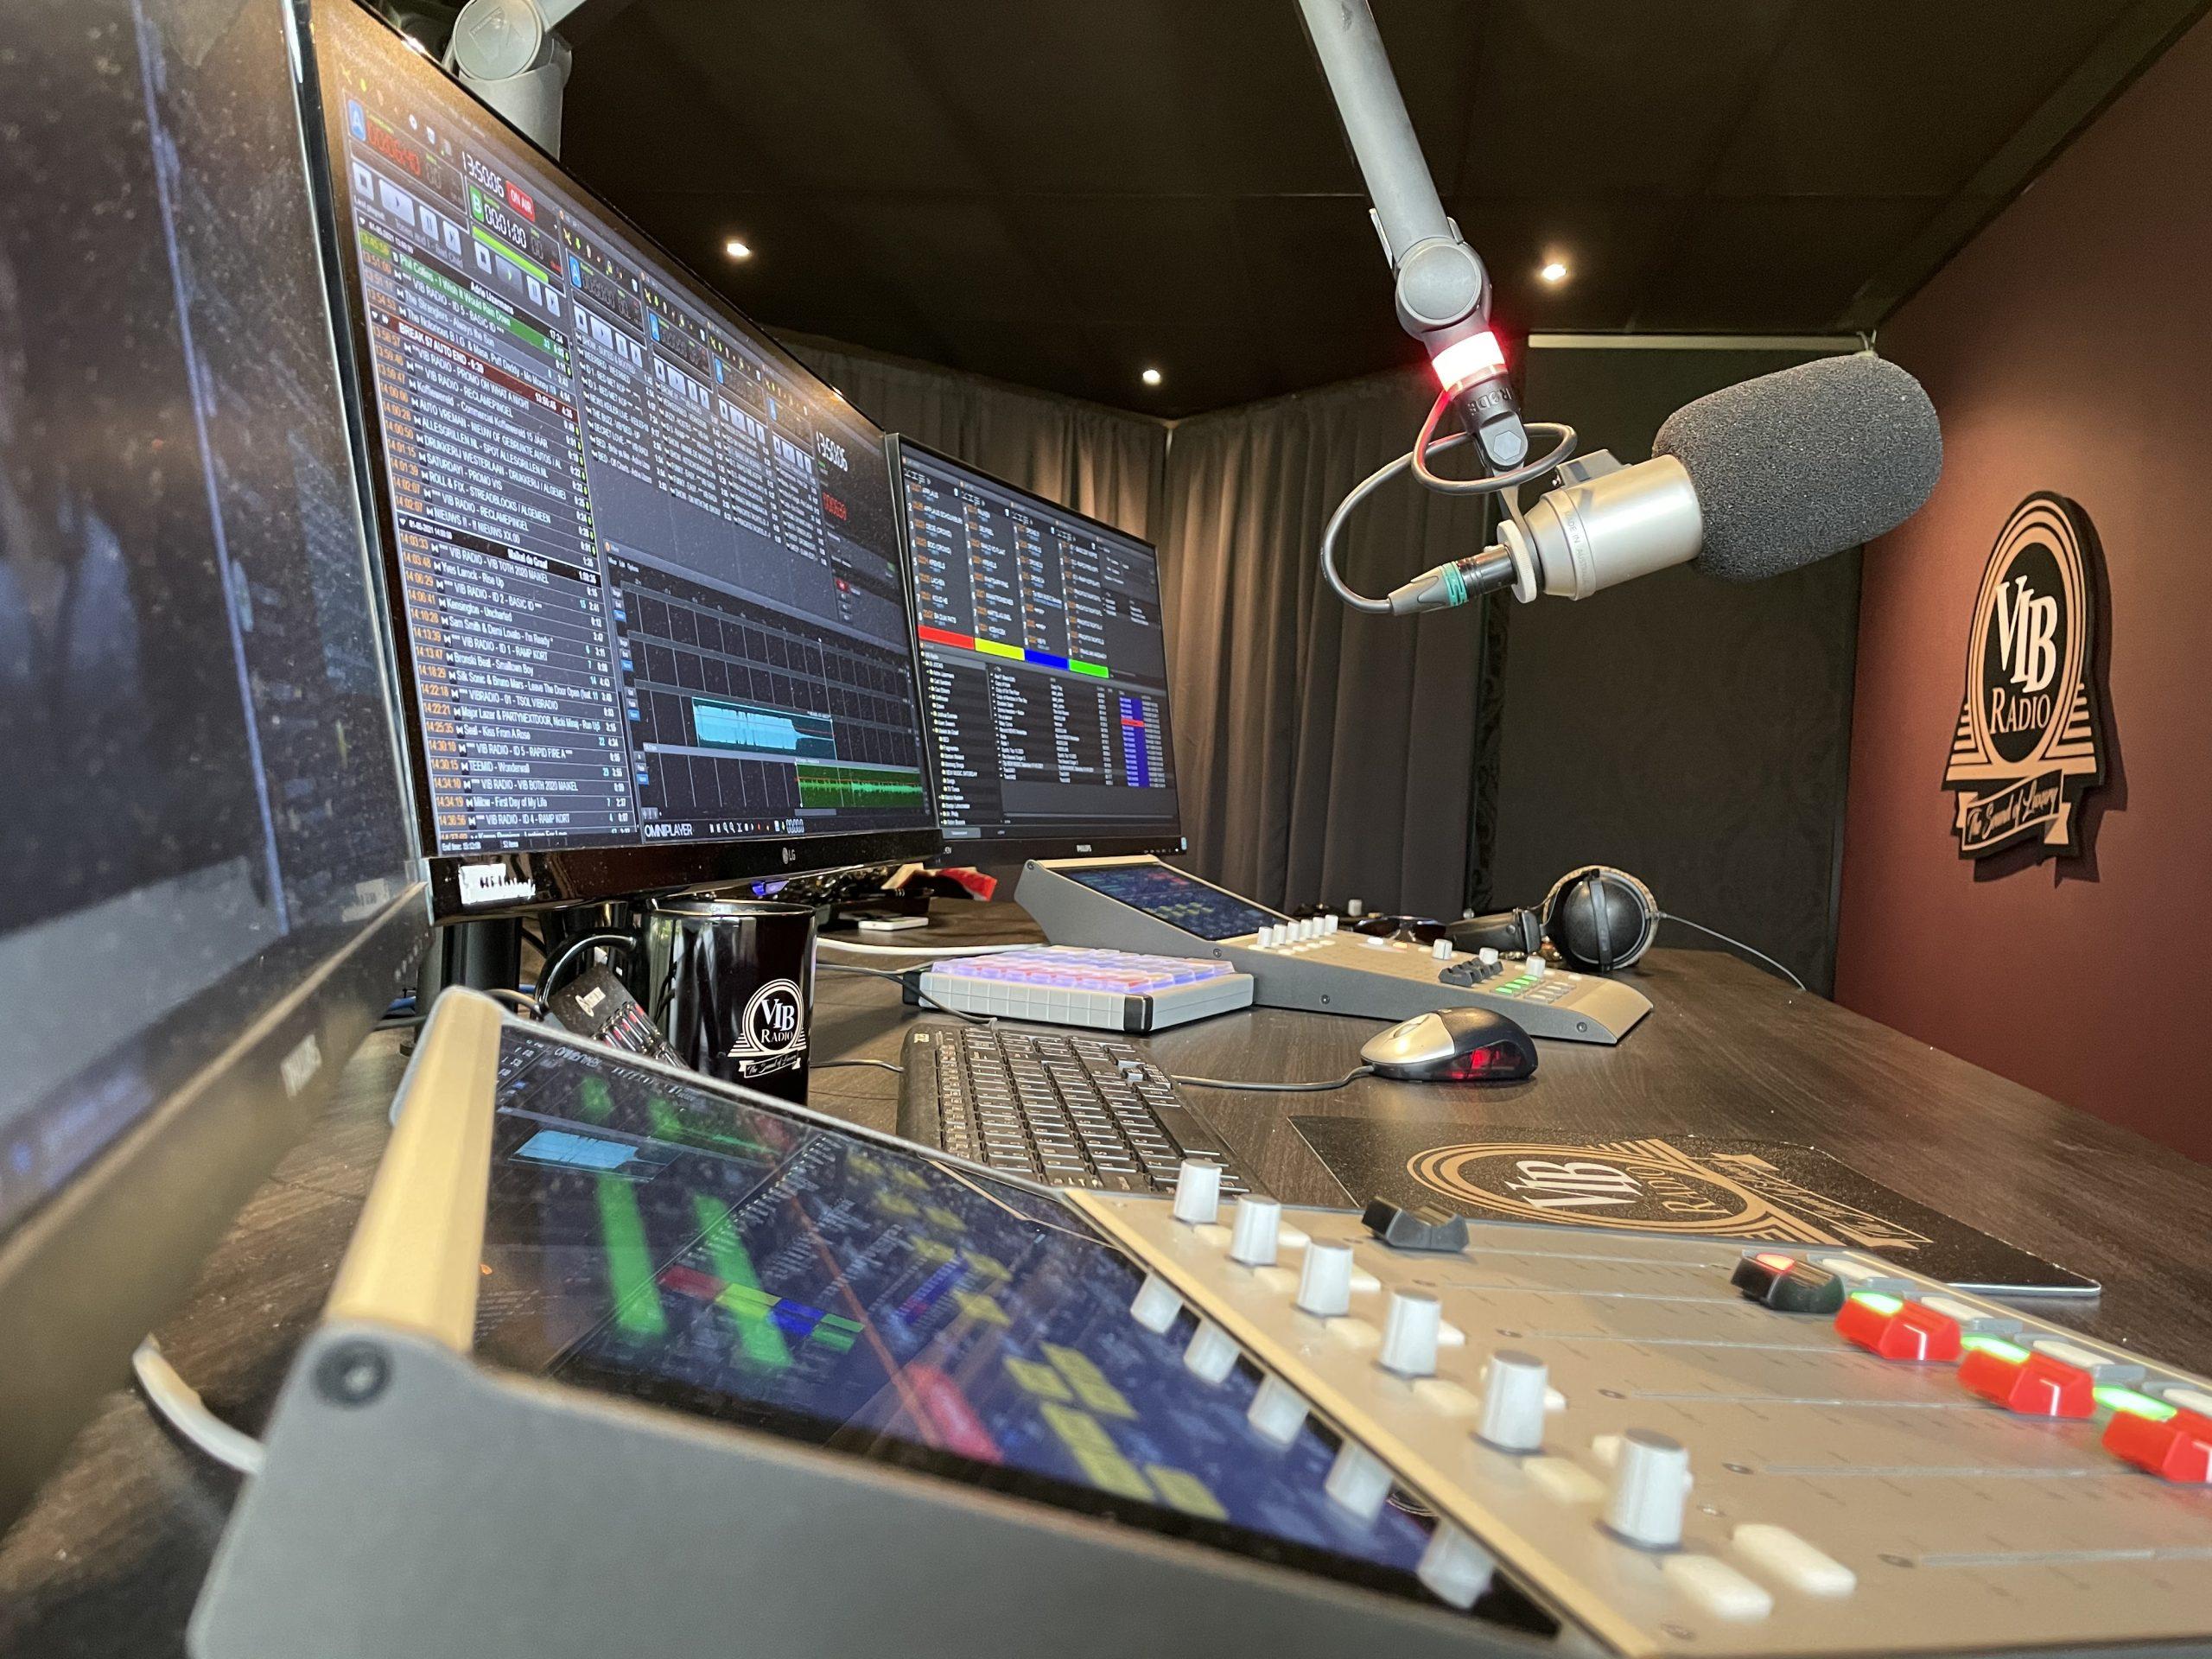 Mancave (studio) - VIB Radio